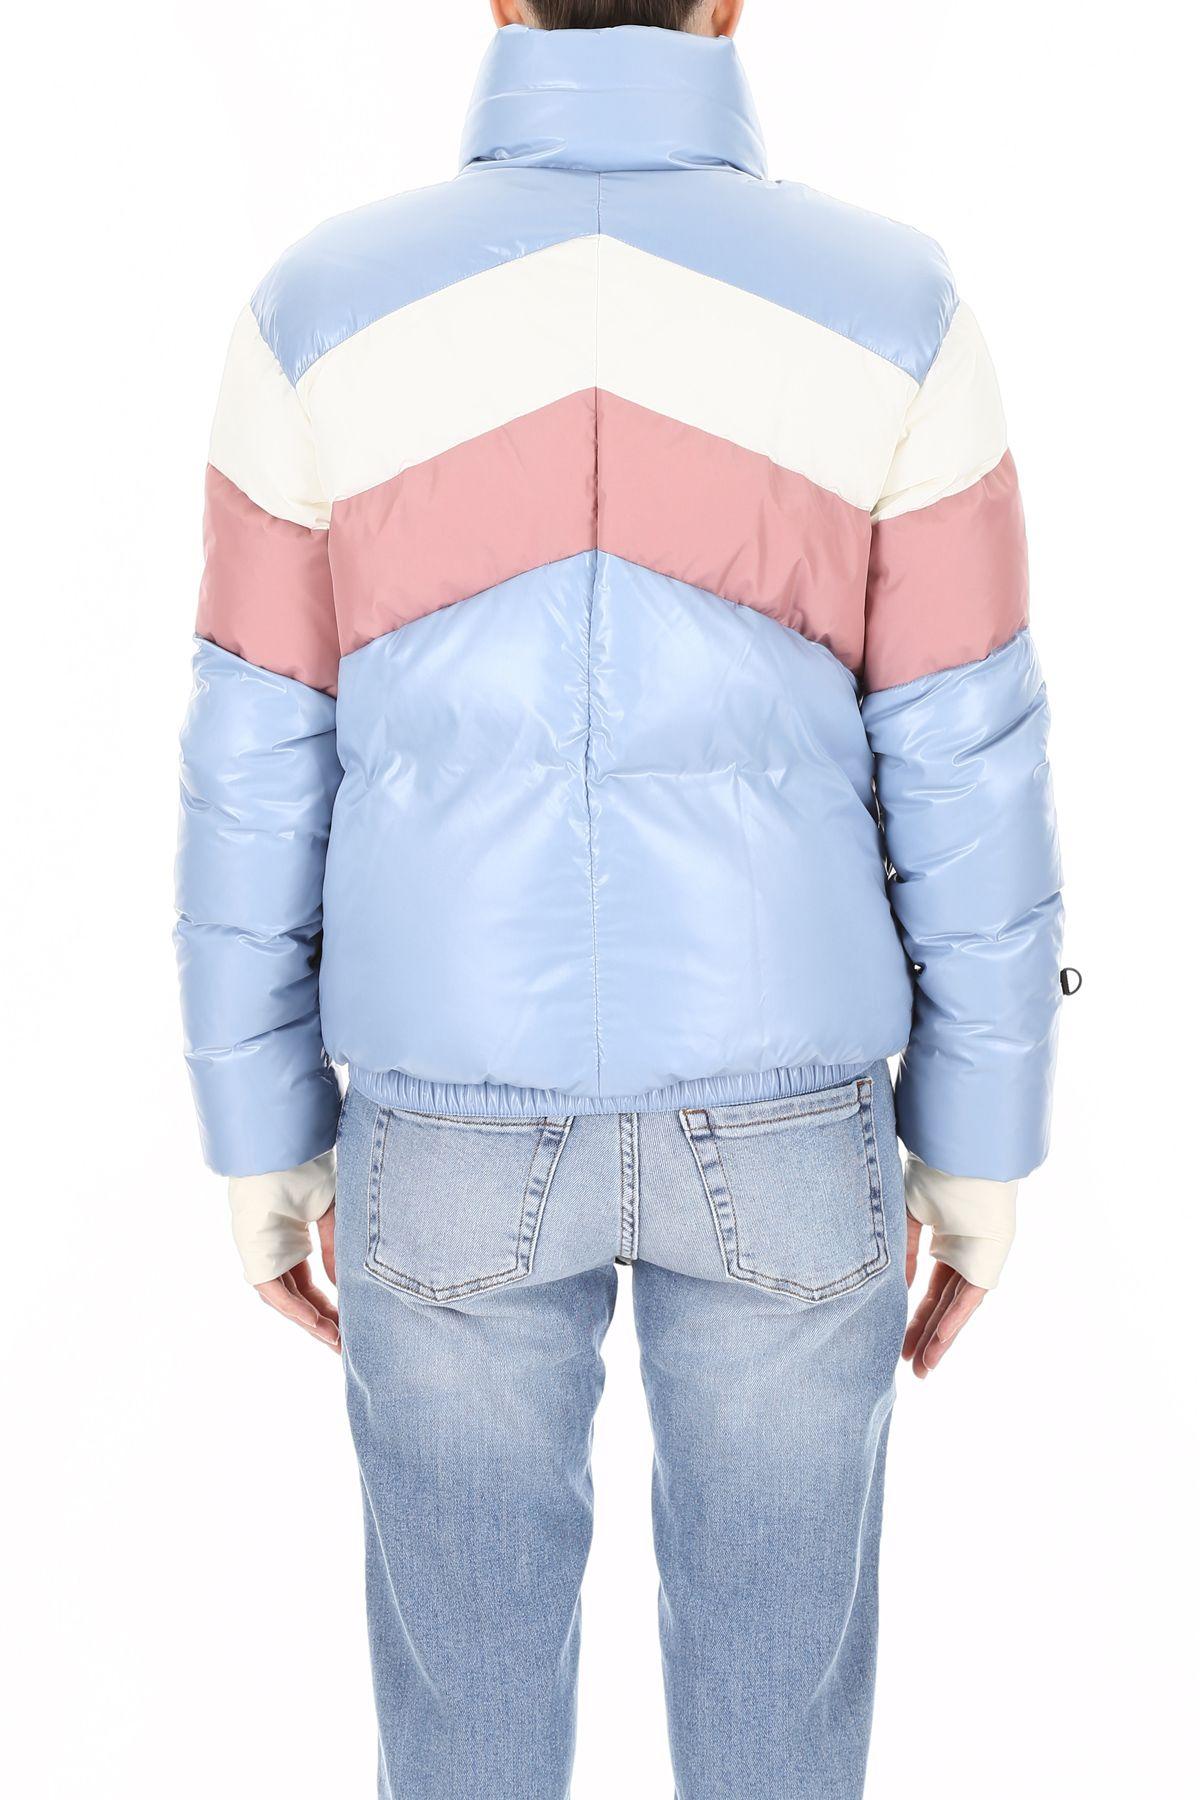 0d724961d Moncler Grenoble Moncler Grenoble Lamar Puffer Jacket - Basic ...